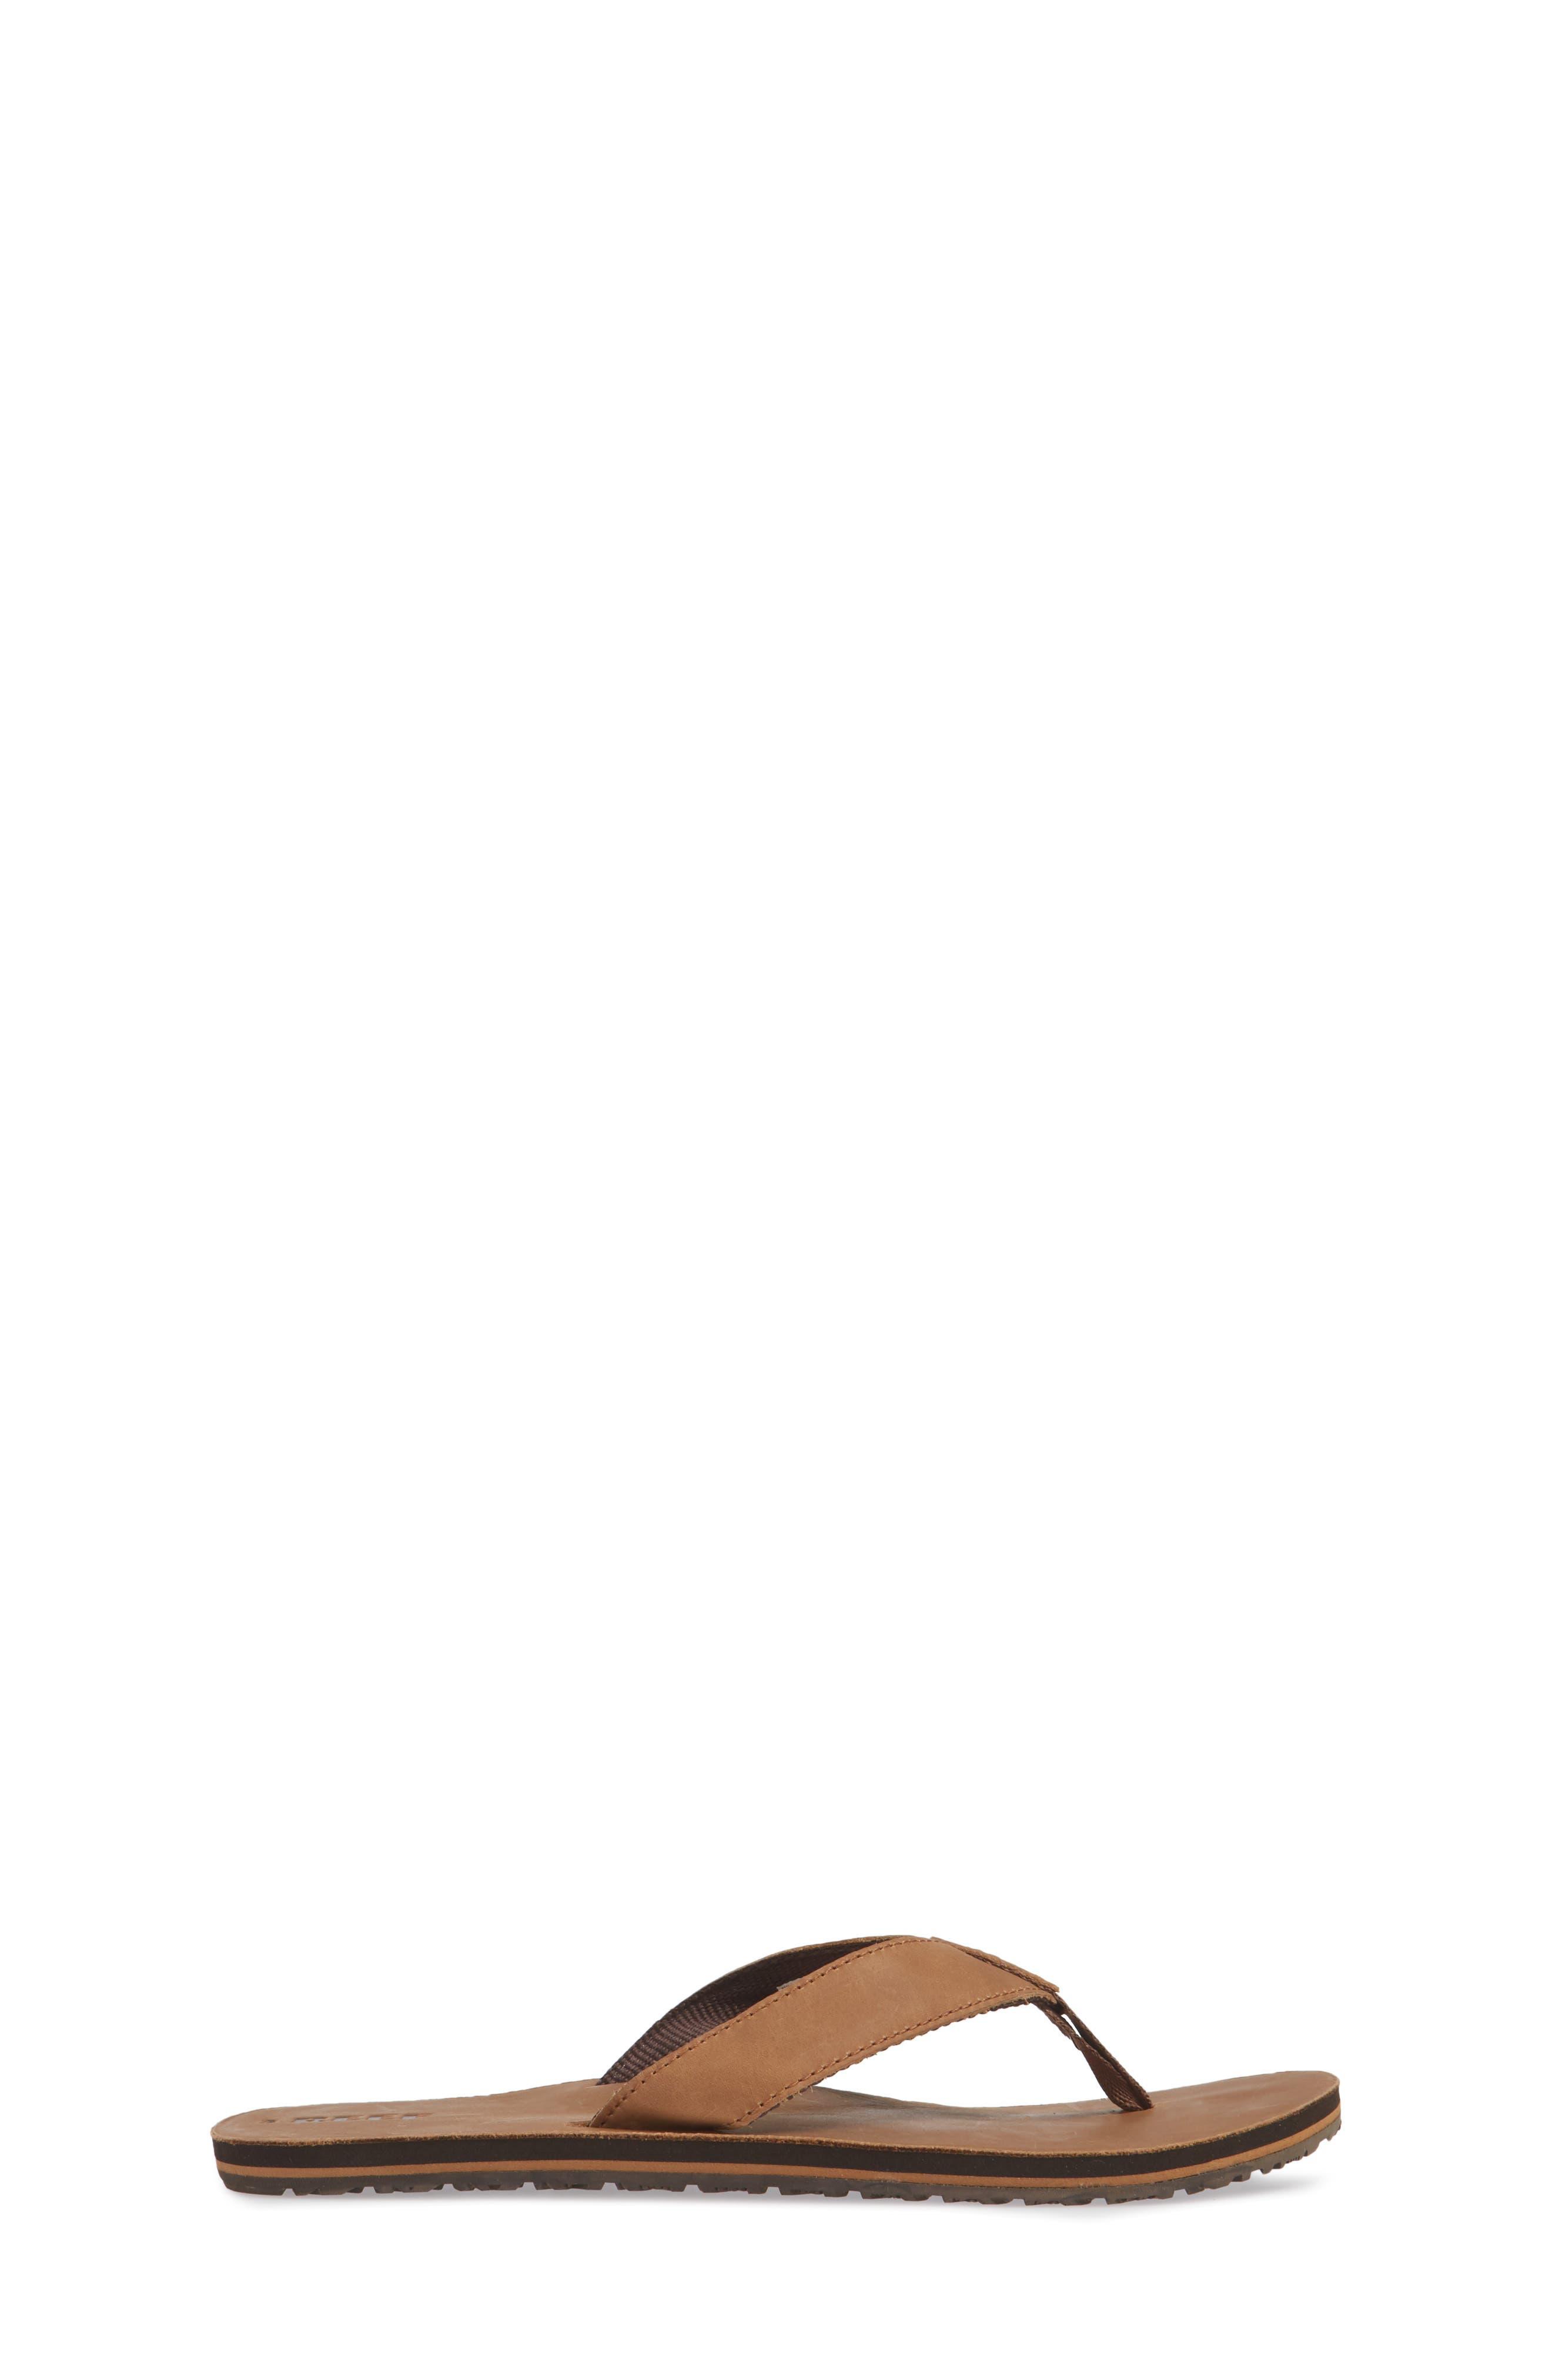 'Grom' Leather Flip-Flop,                             Alternate thumbnail 3, color,                             200